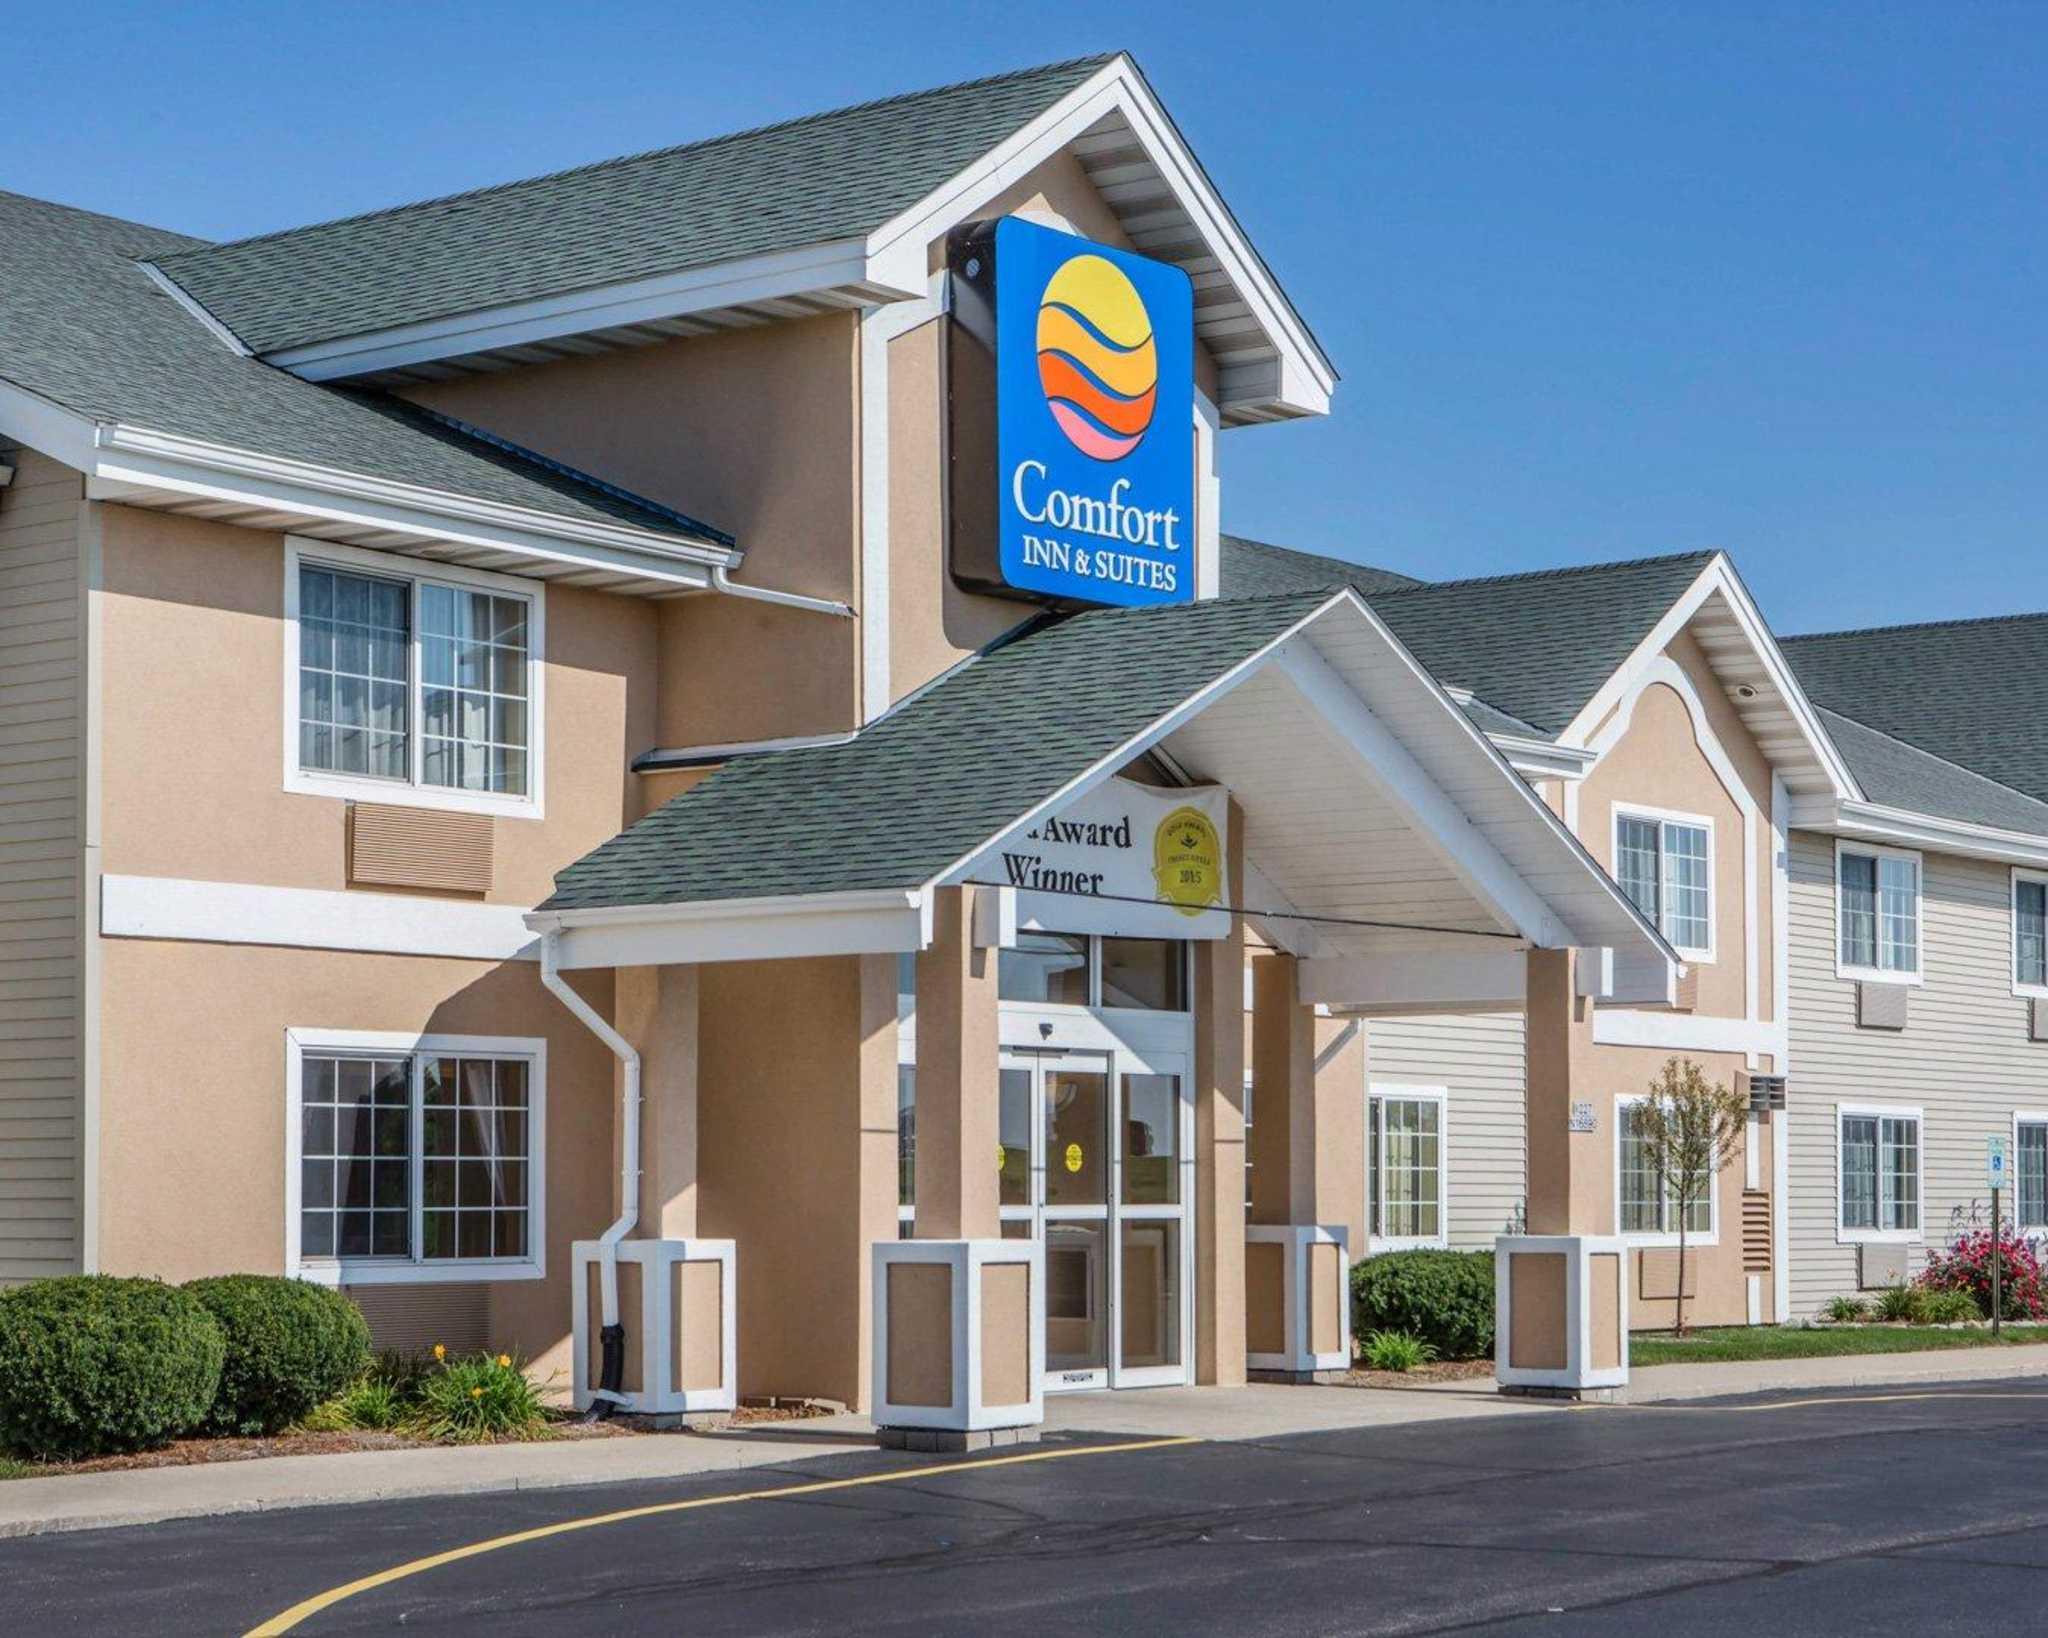 Comfort Inn & Suites Jackson - West Bend image 1